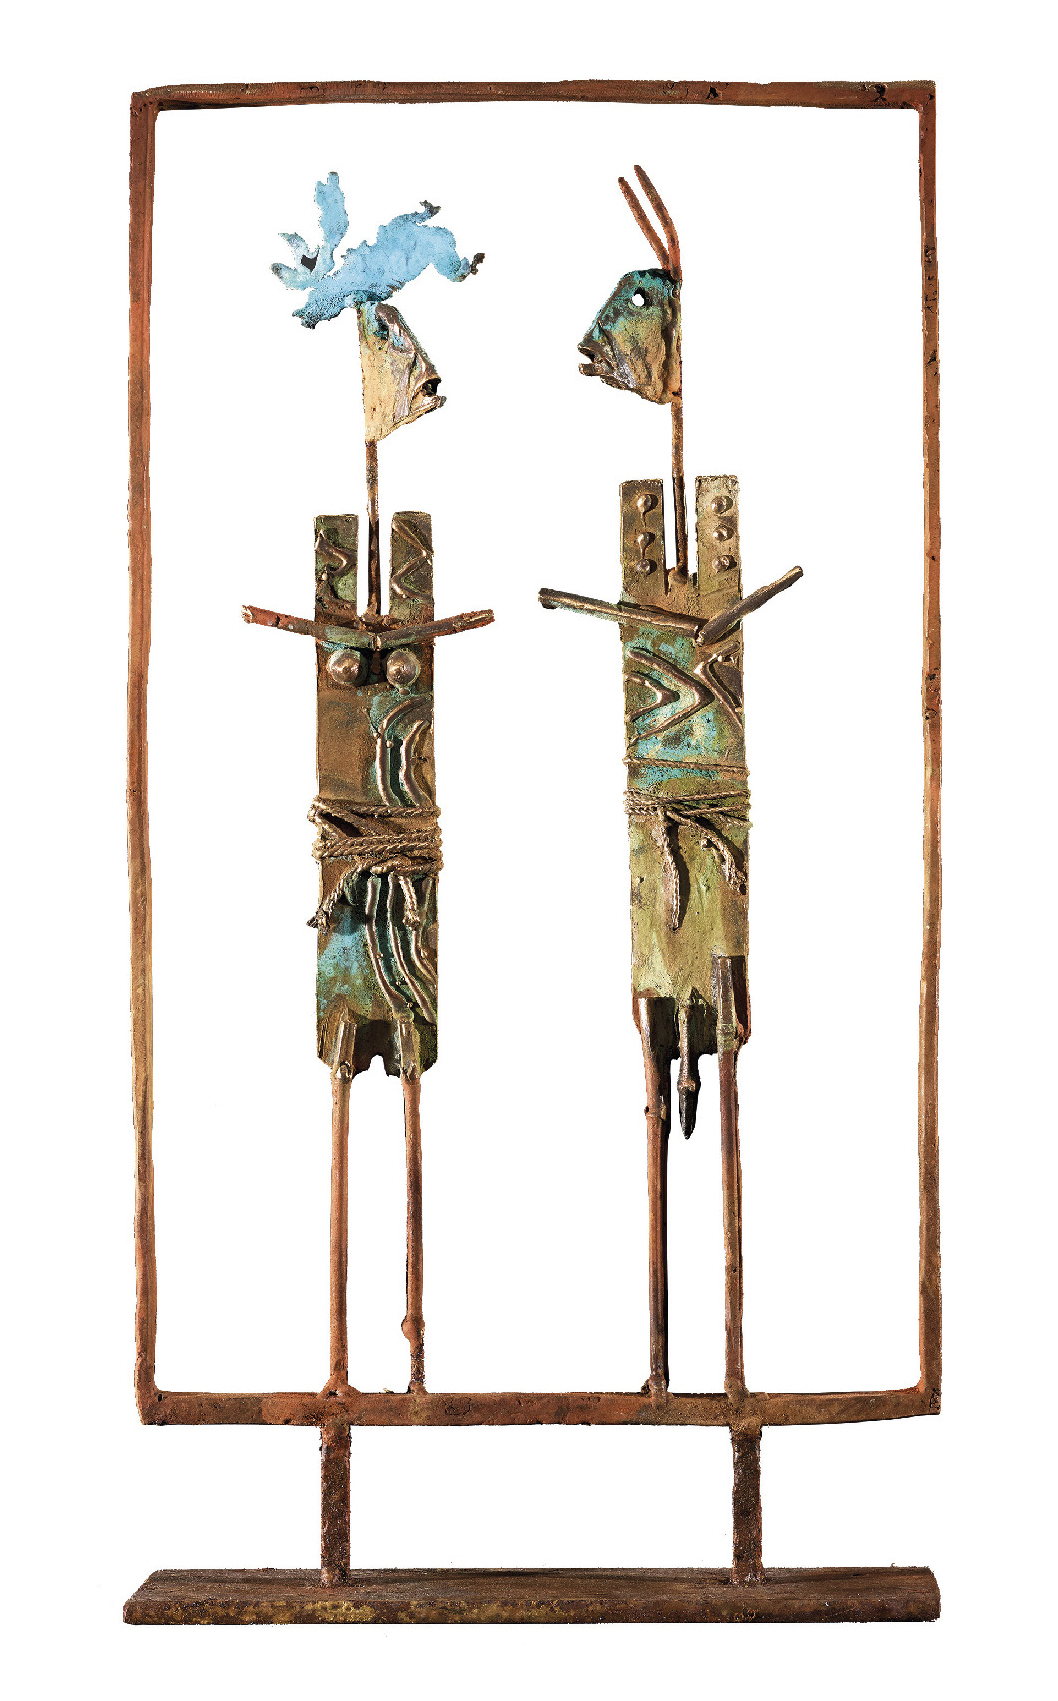 Giorgi Claude (1954) Couple Dogon, 2018 - Bronze - H. 50 cm L. 30 cm l. 18 cm -